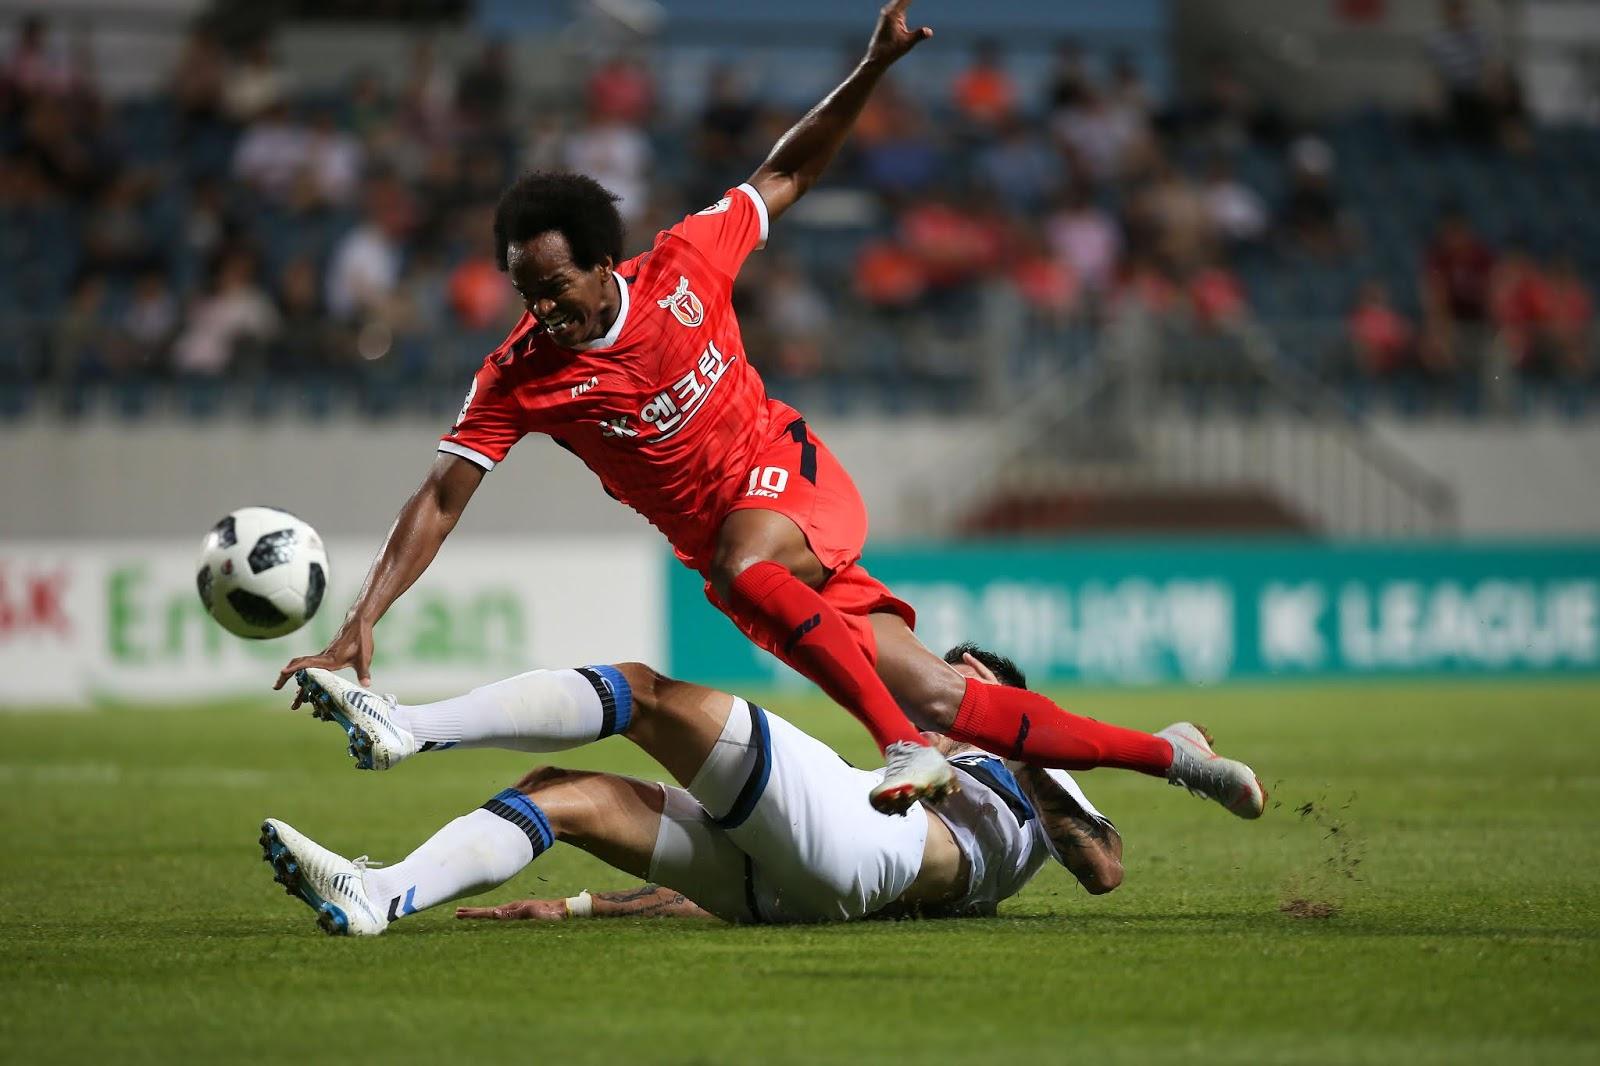 K League 1 Preview: Jeju United vs Suwon Bluewings